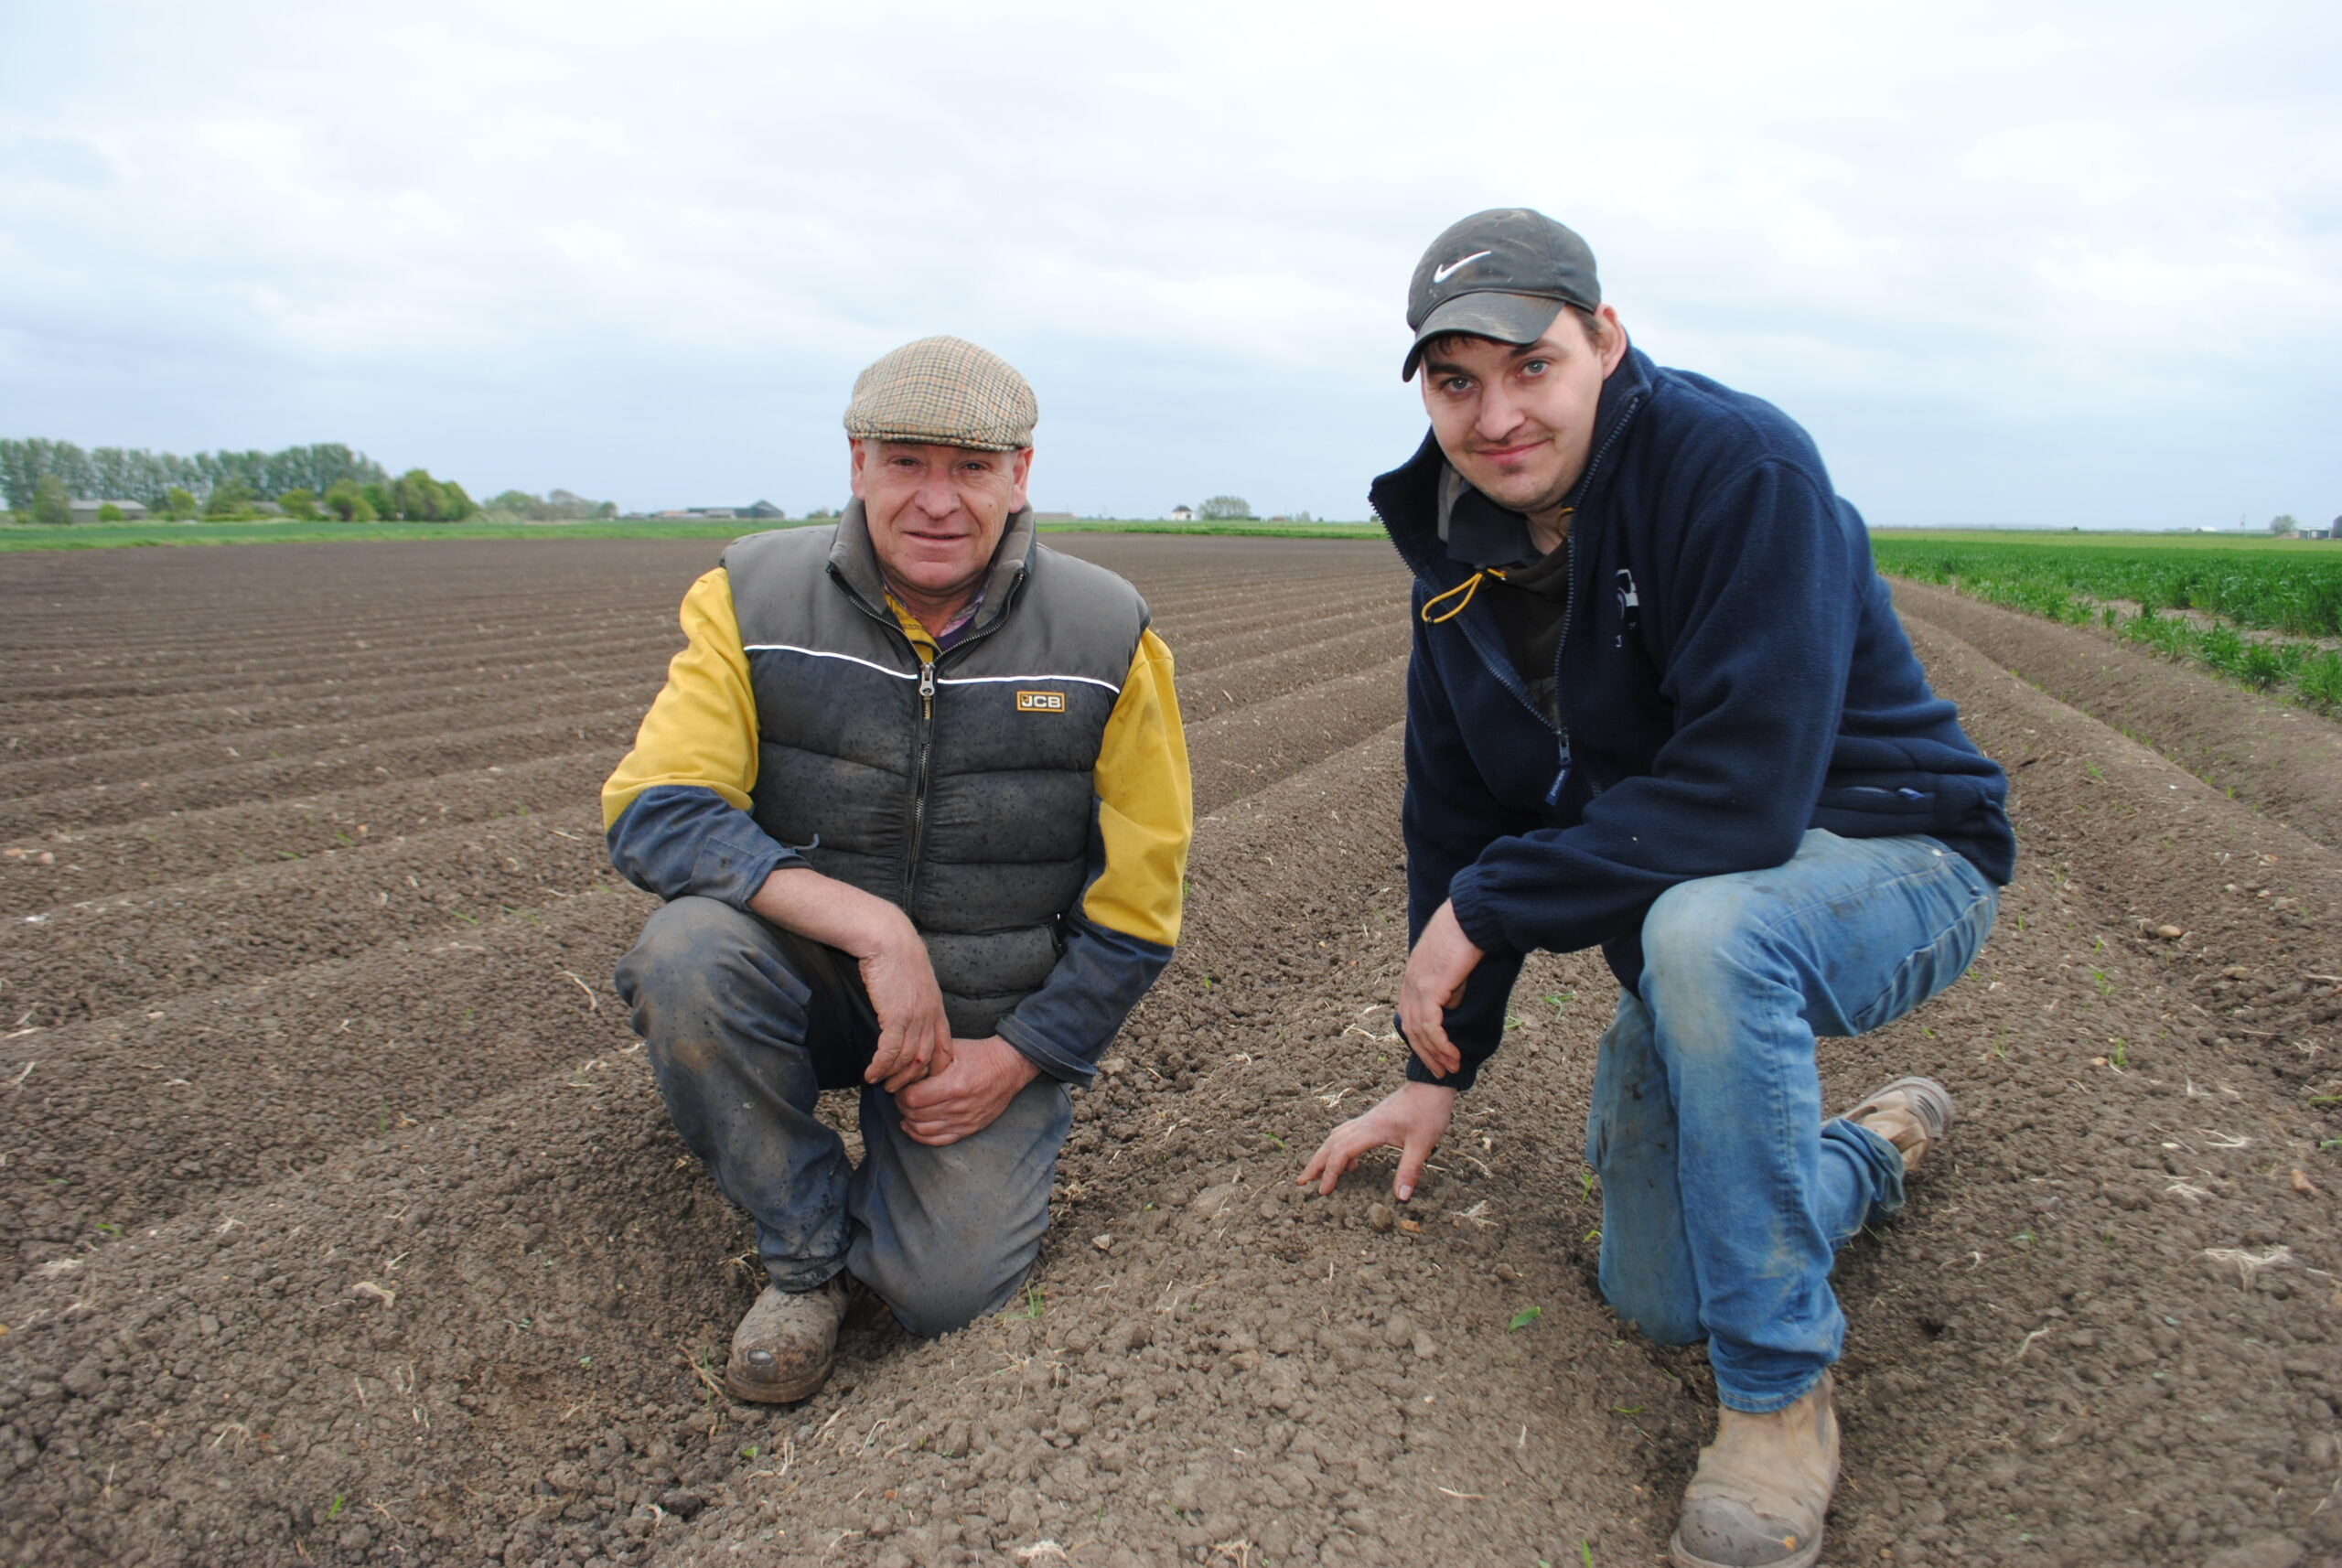 Farmer Story – Relinquishing Fertiliser Application Responsibility Frees Up Management Time